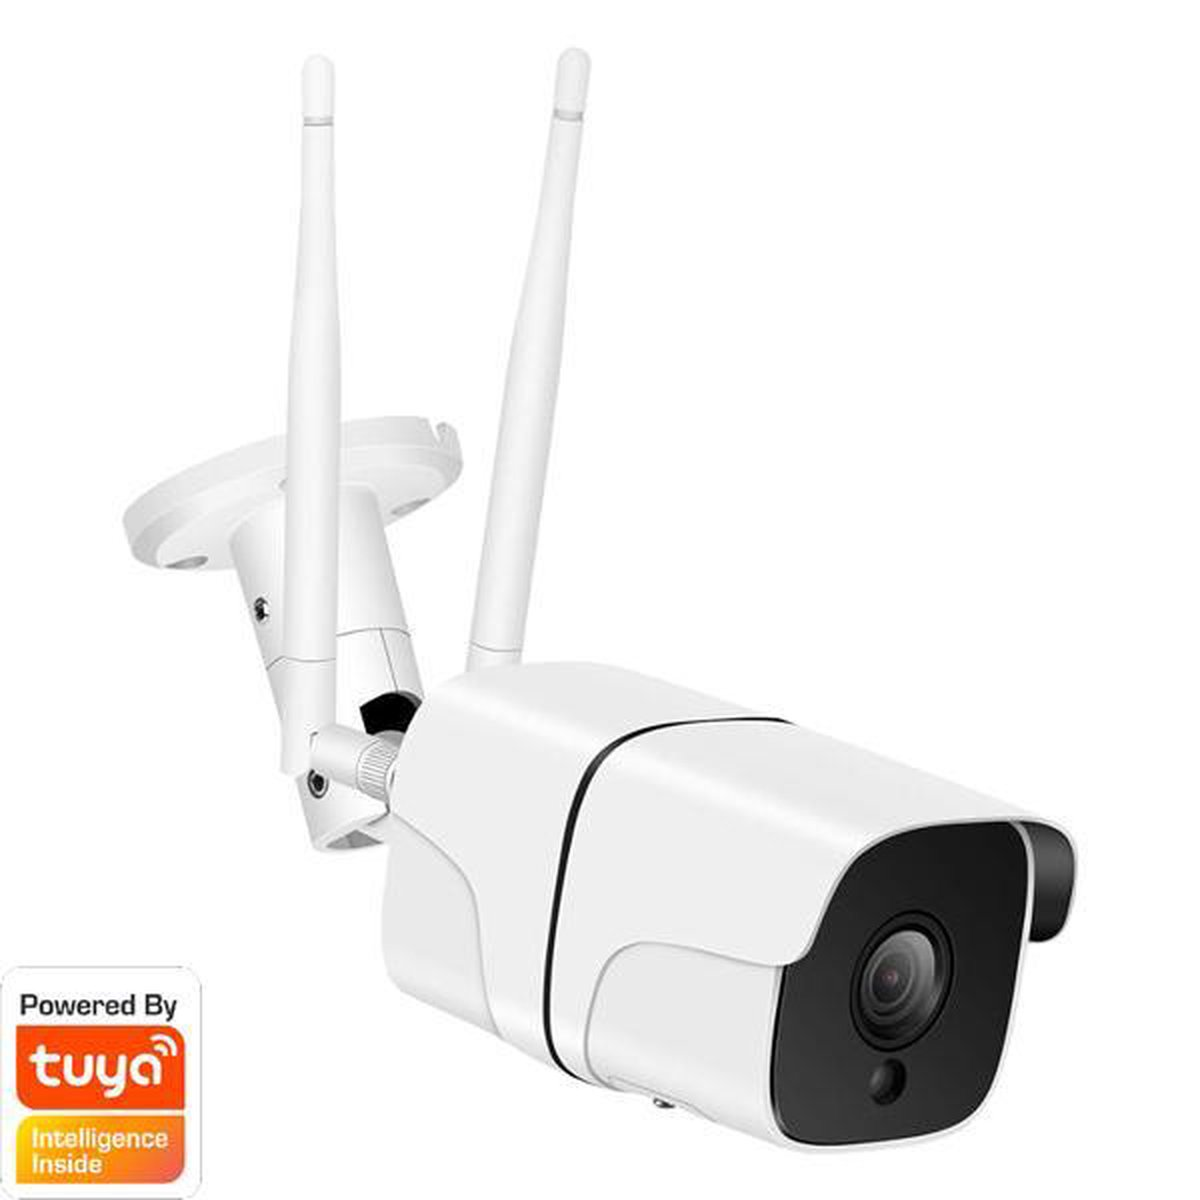 Denver SHO-110 - Camera beveiliging - Smart Home Solutions - Outdoor Camera - Wekrt met TUYA - met n